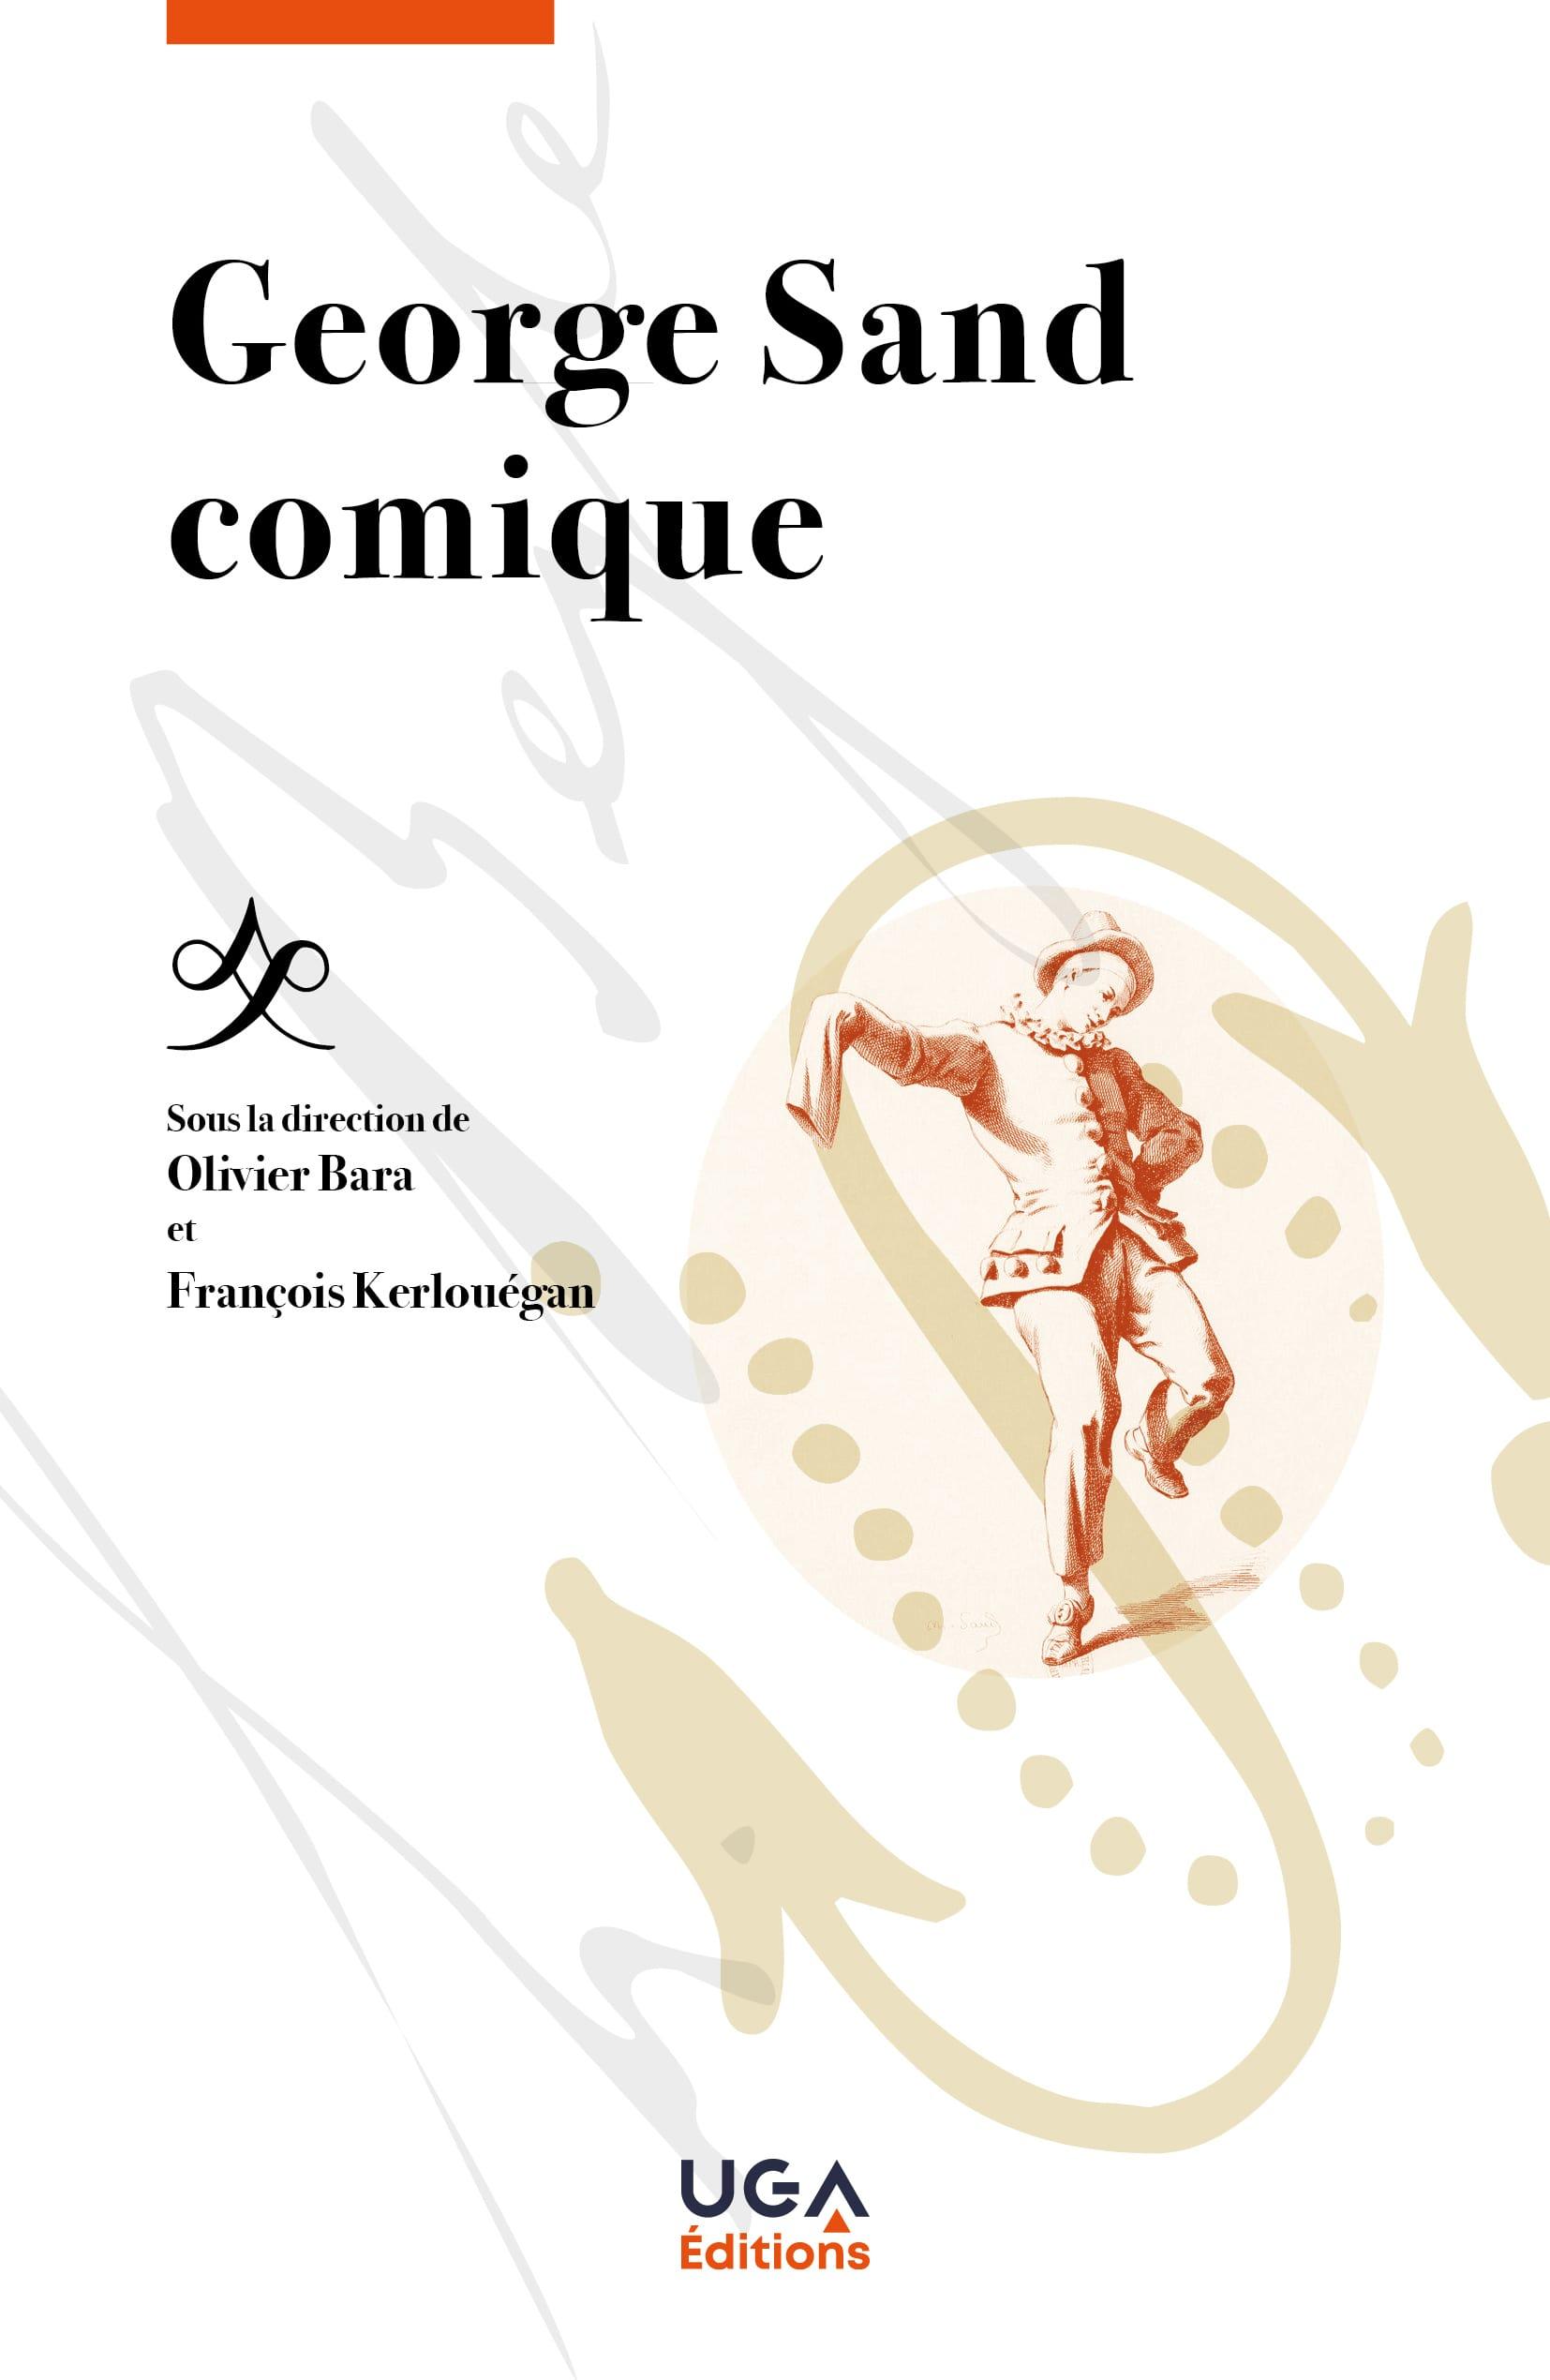 O. Bara, F. Kerlouégan (dir.), George Sand comique